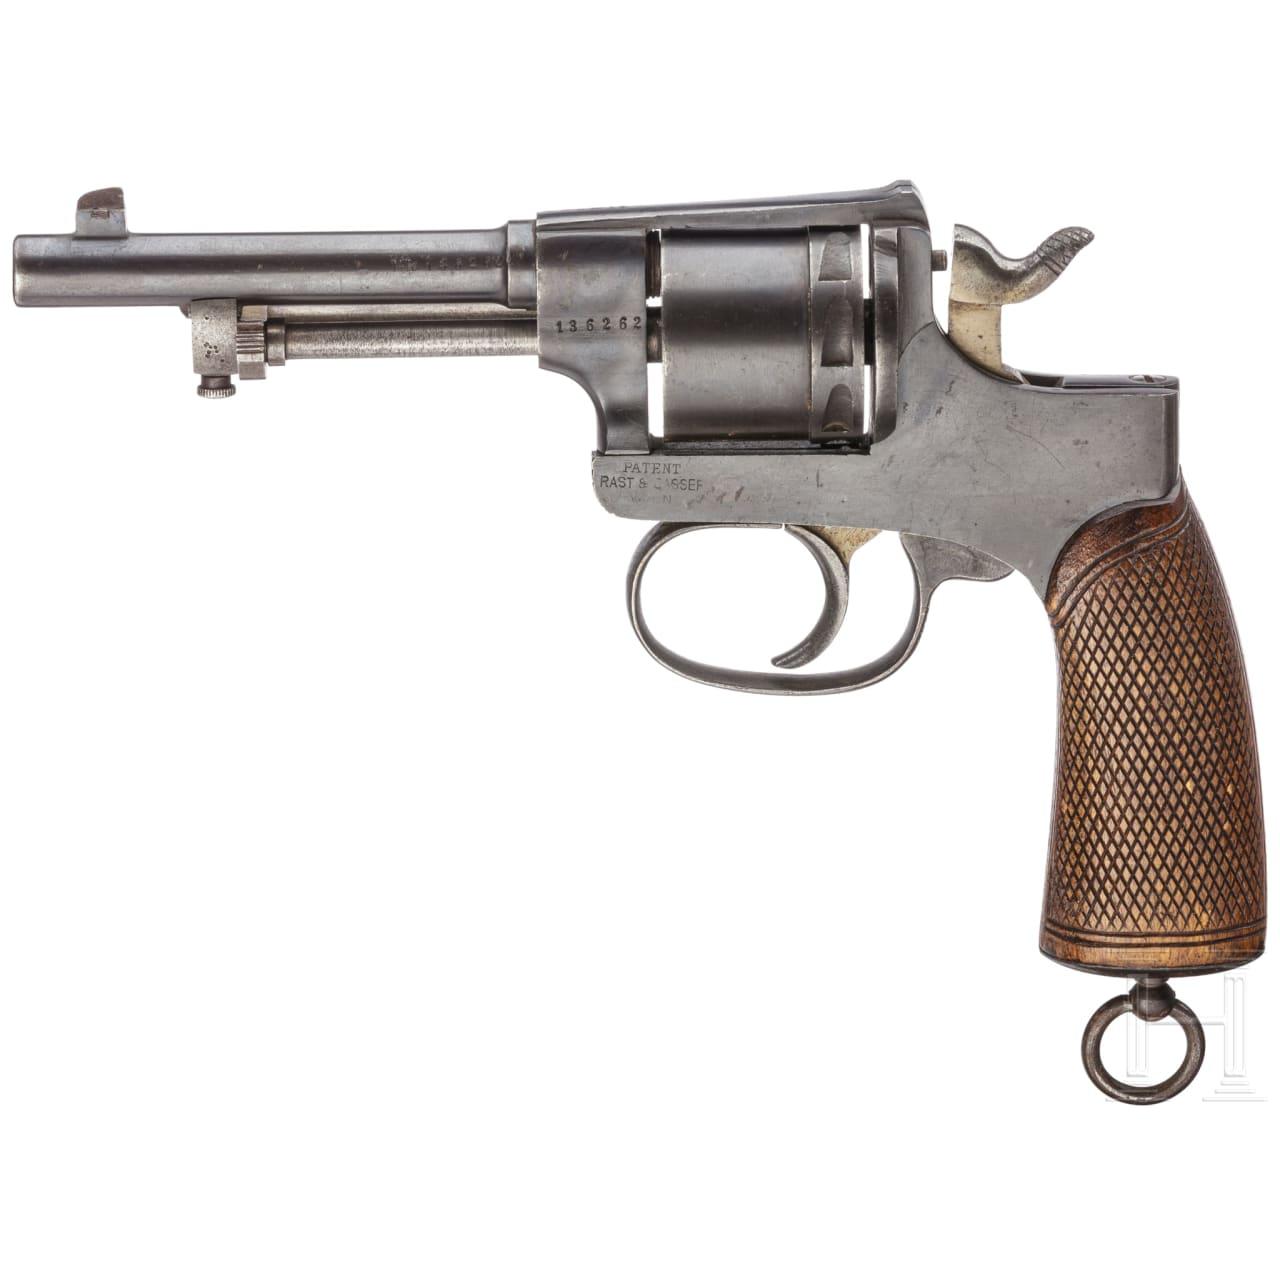 A revolver Rast & Gasser, Mod 1898, 1917